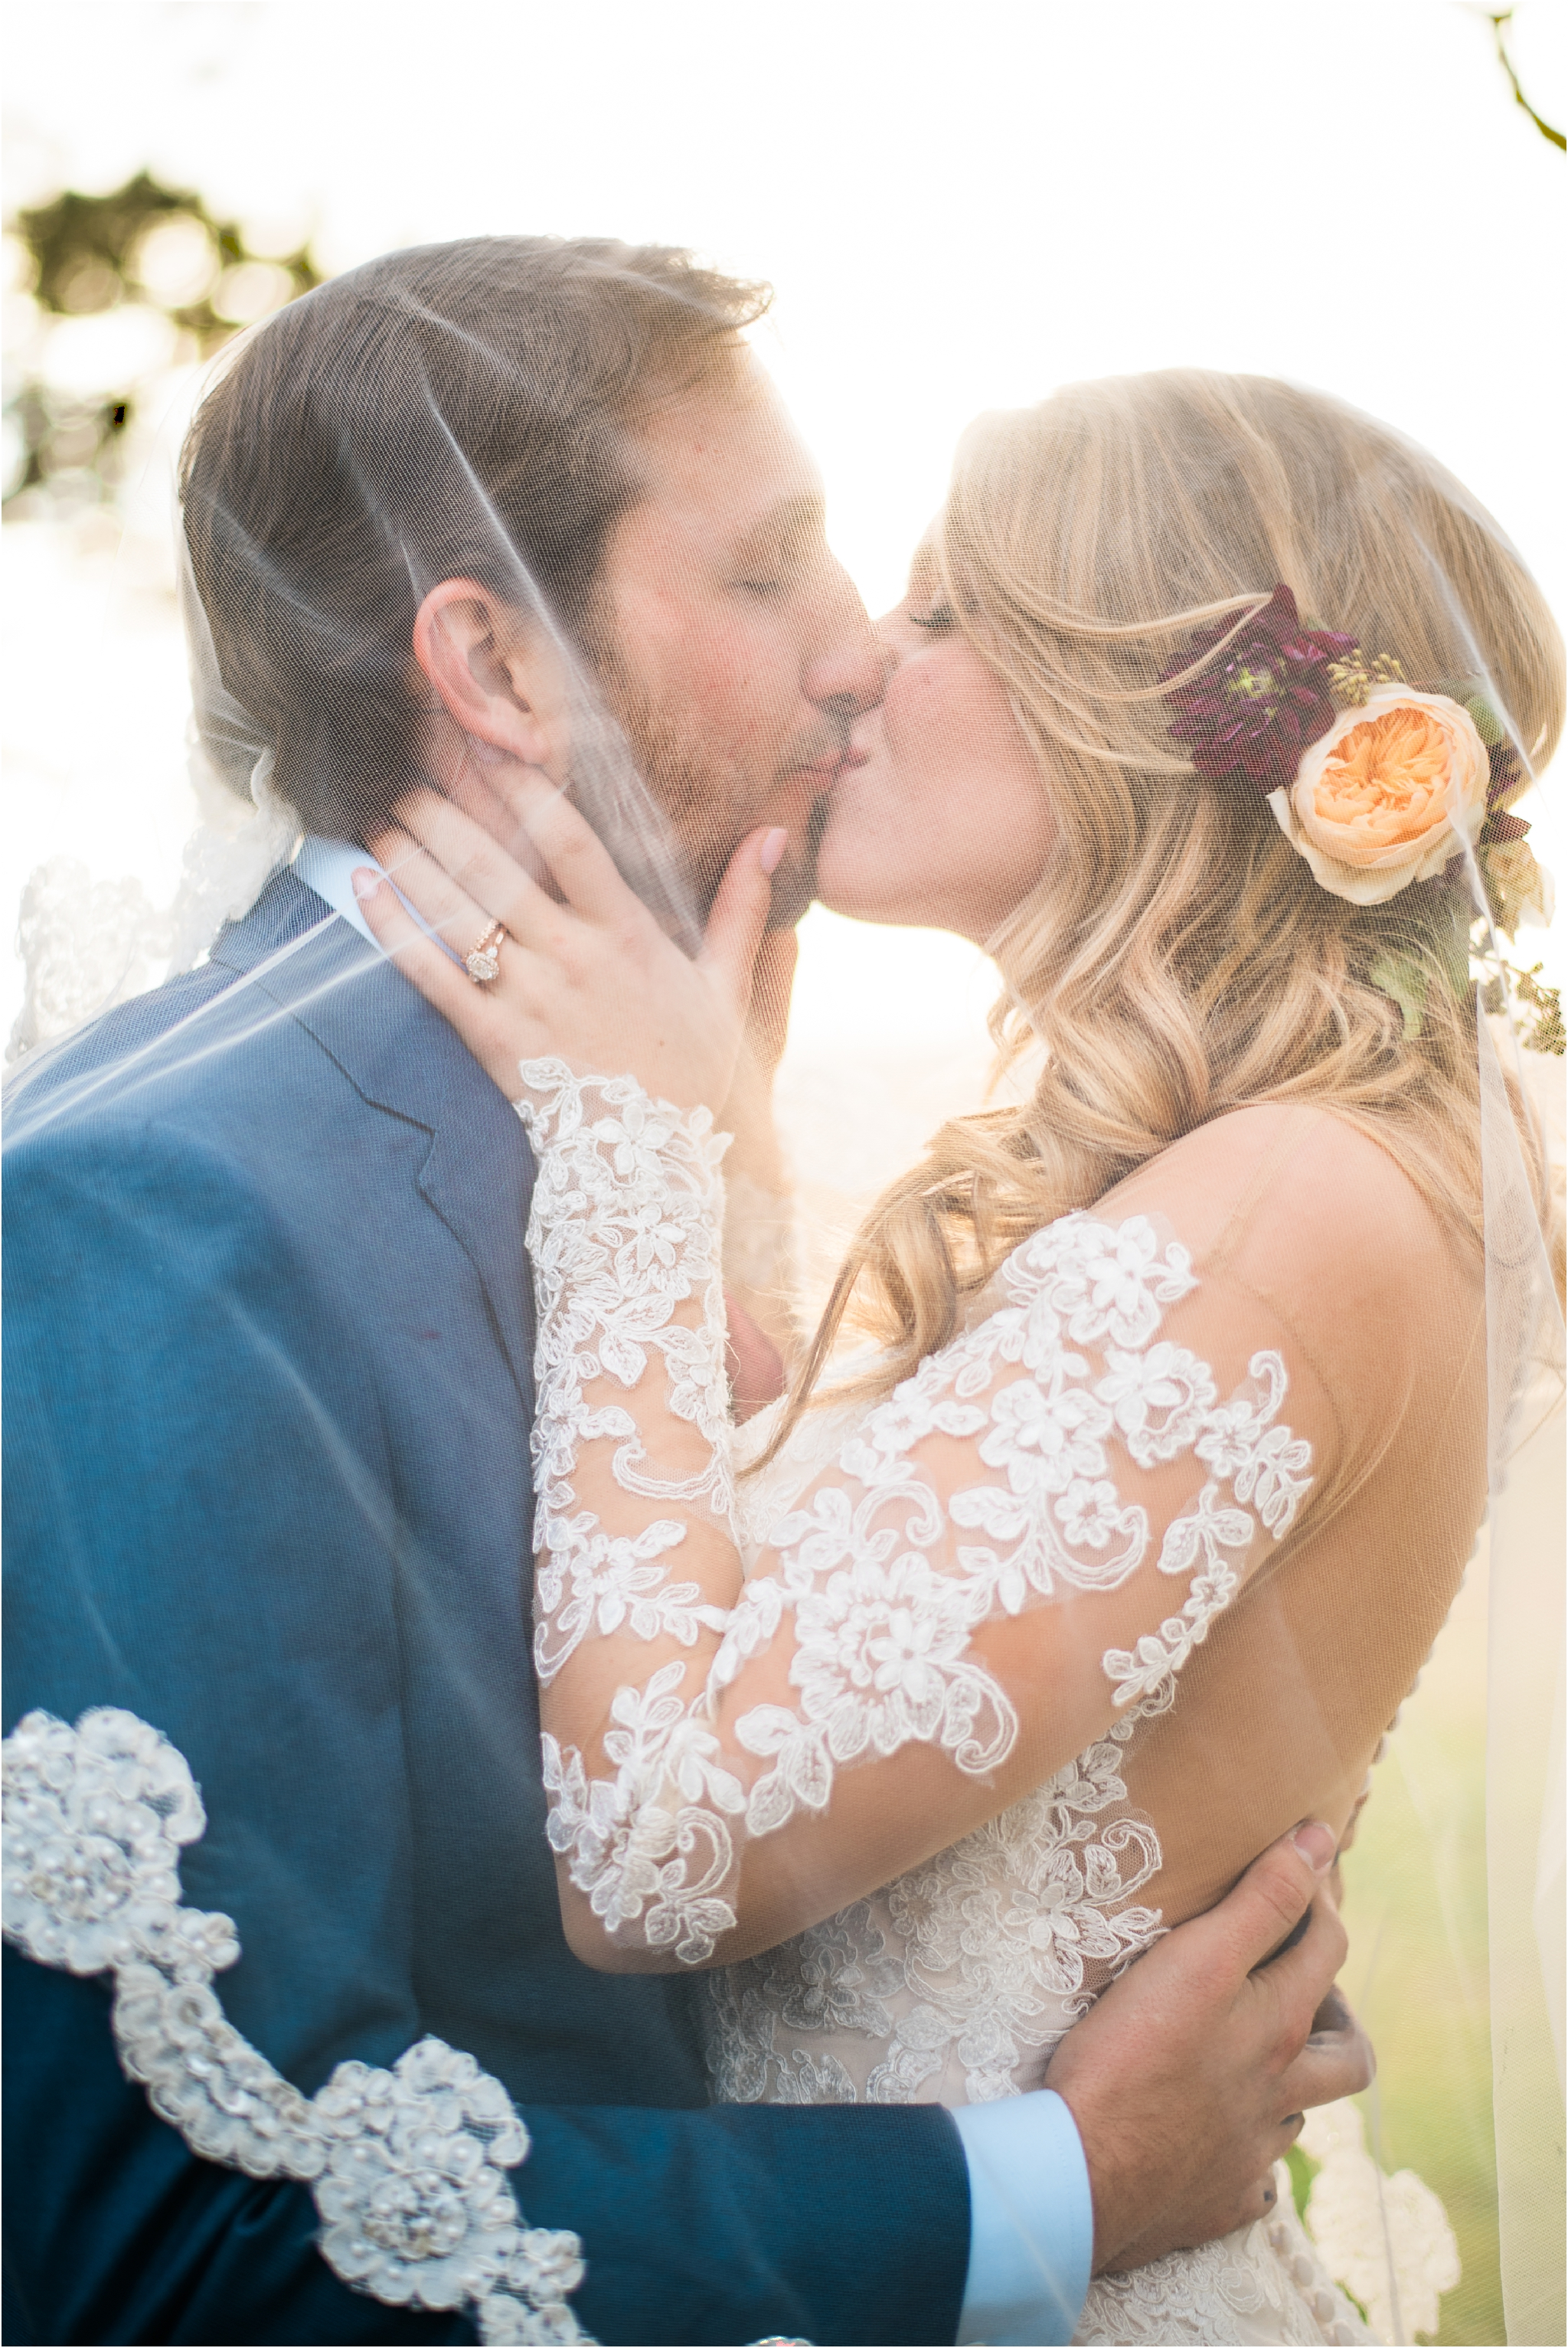 Wheeler + Wedding